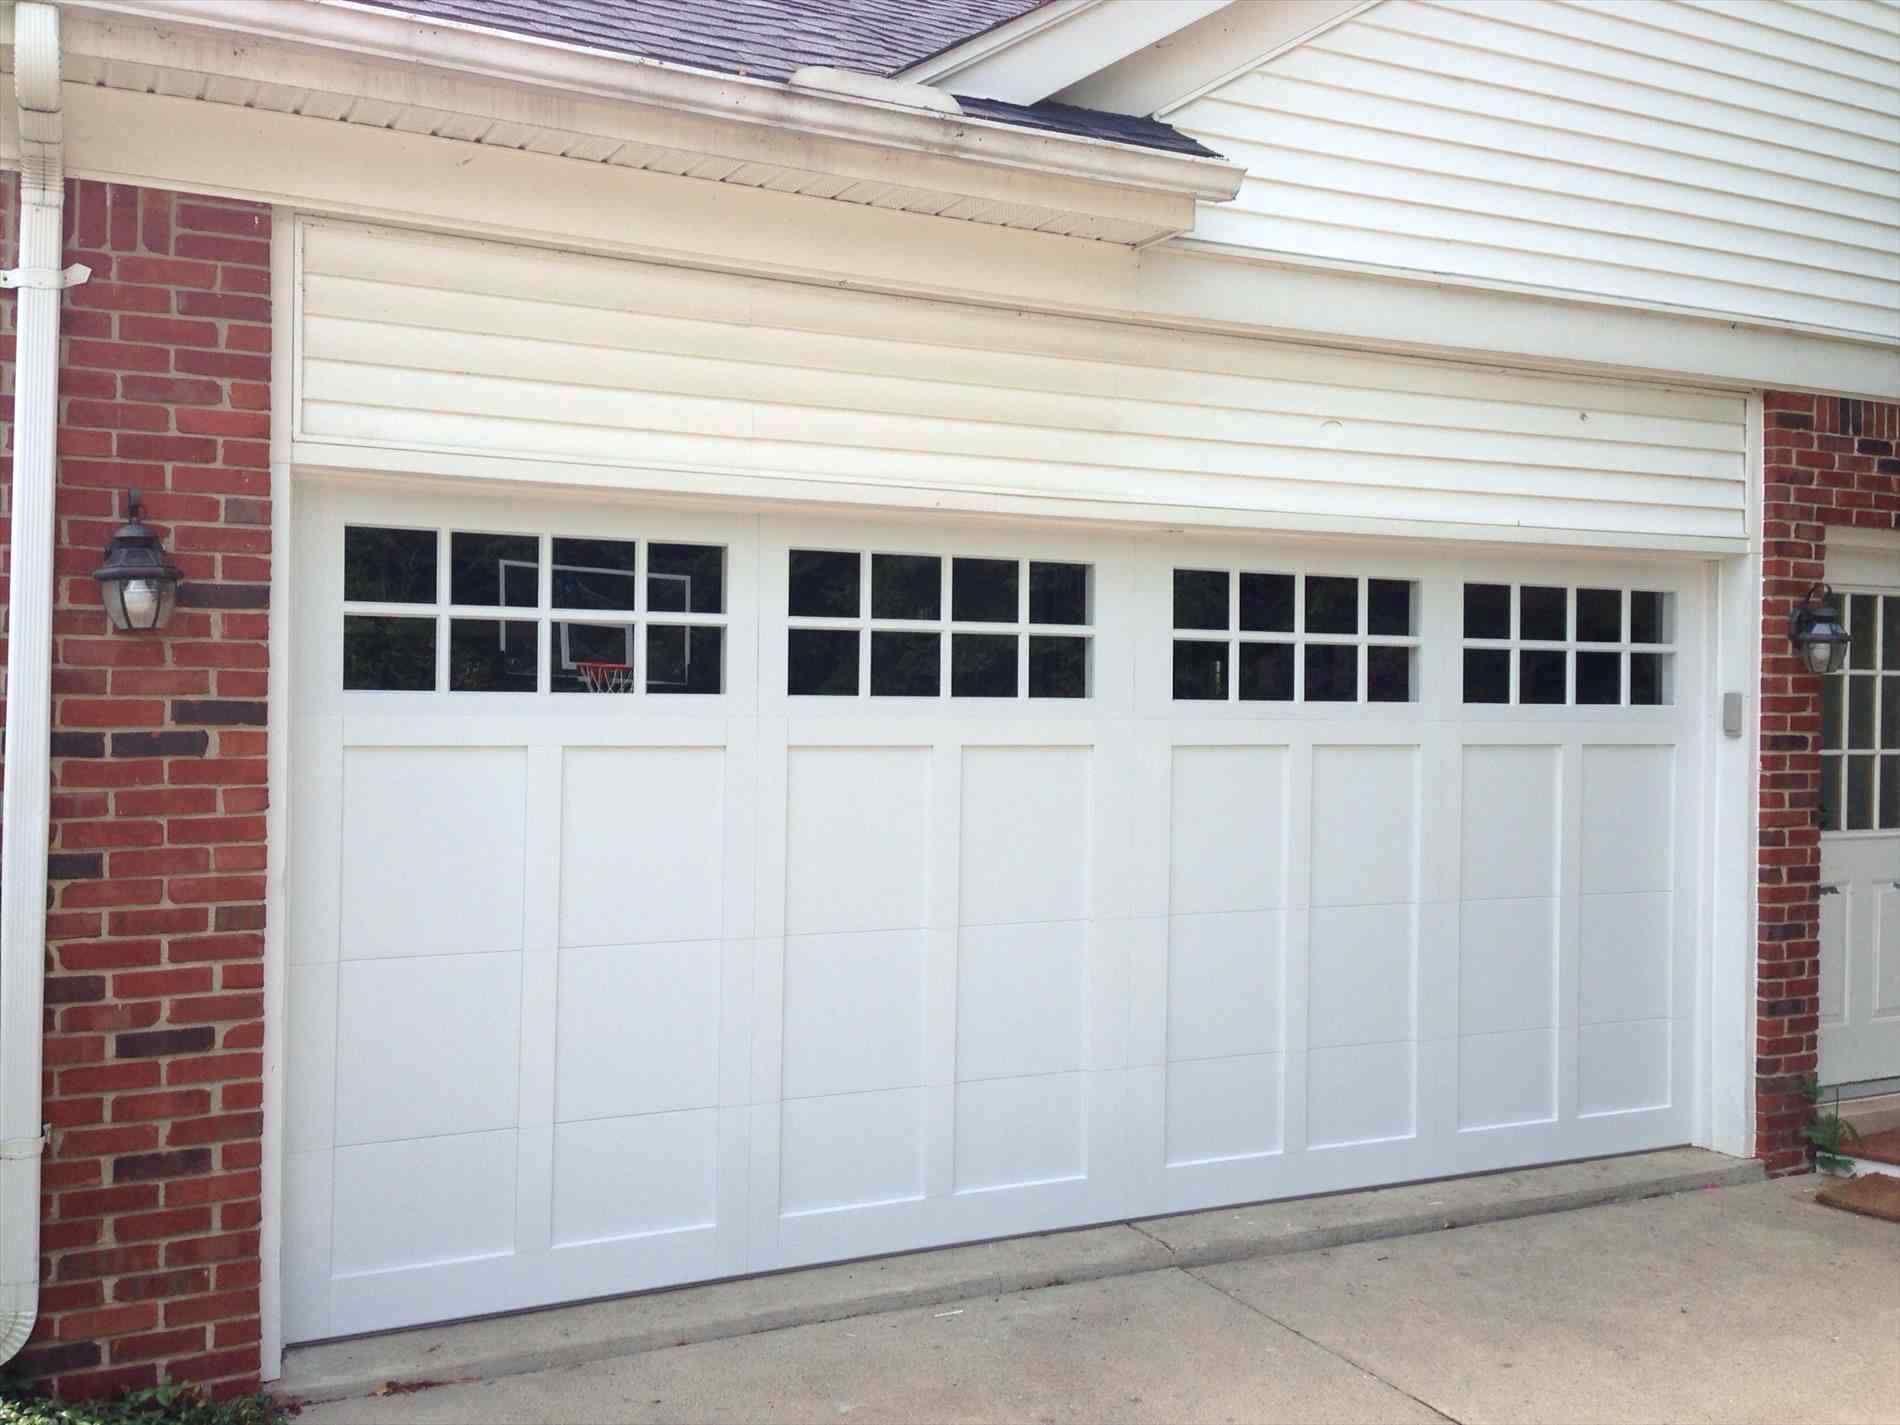 Licious Fake Garage Door Windows Idea Diy Faux Carriage Doors Garage Doors Chi Garage Doors Carriage House Garage Doors